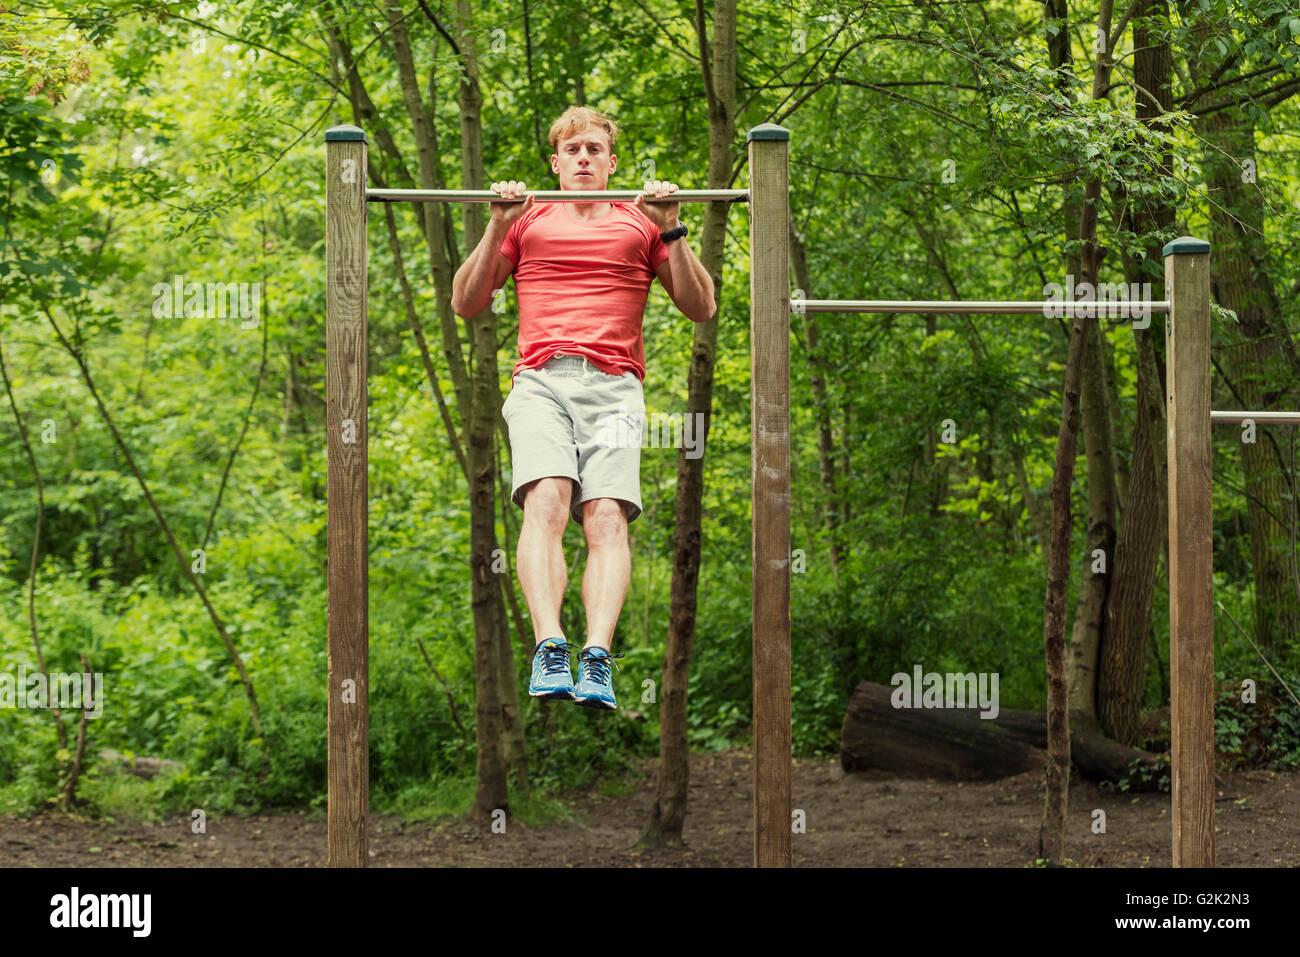 Atleta Masculino haciendo muscle-up en la barra horizontal Imagen De Stock